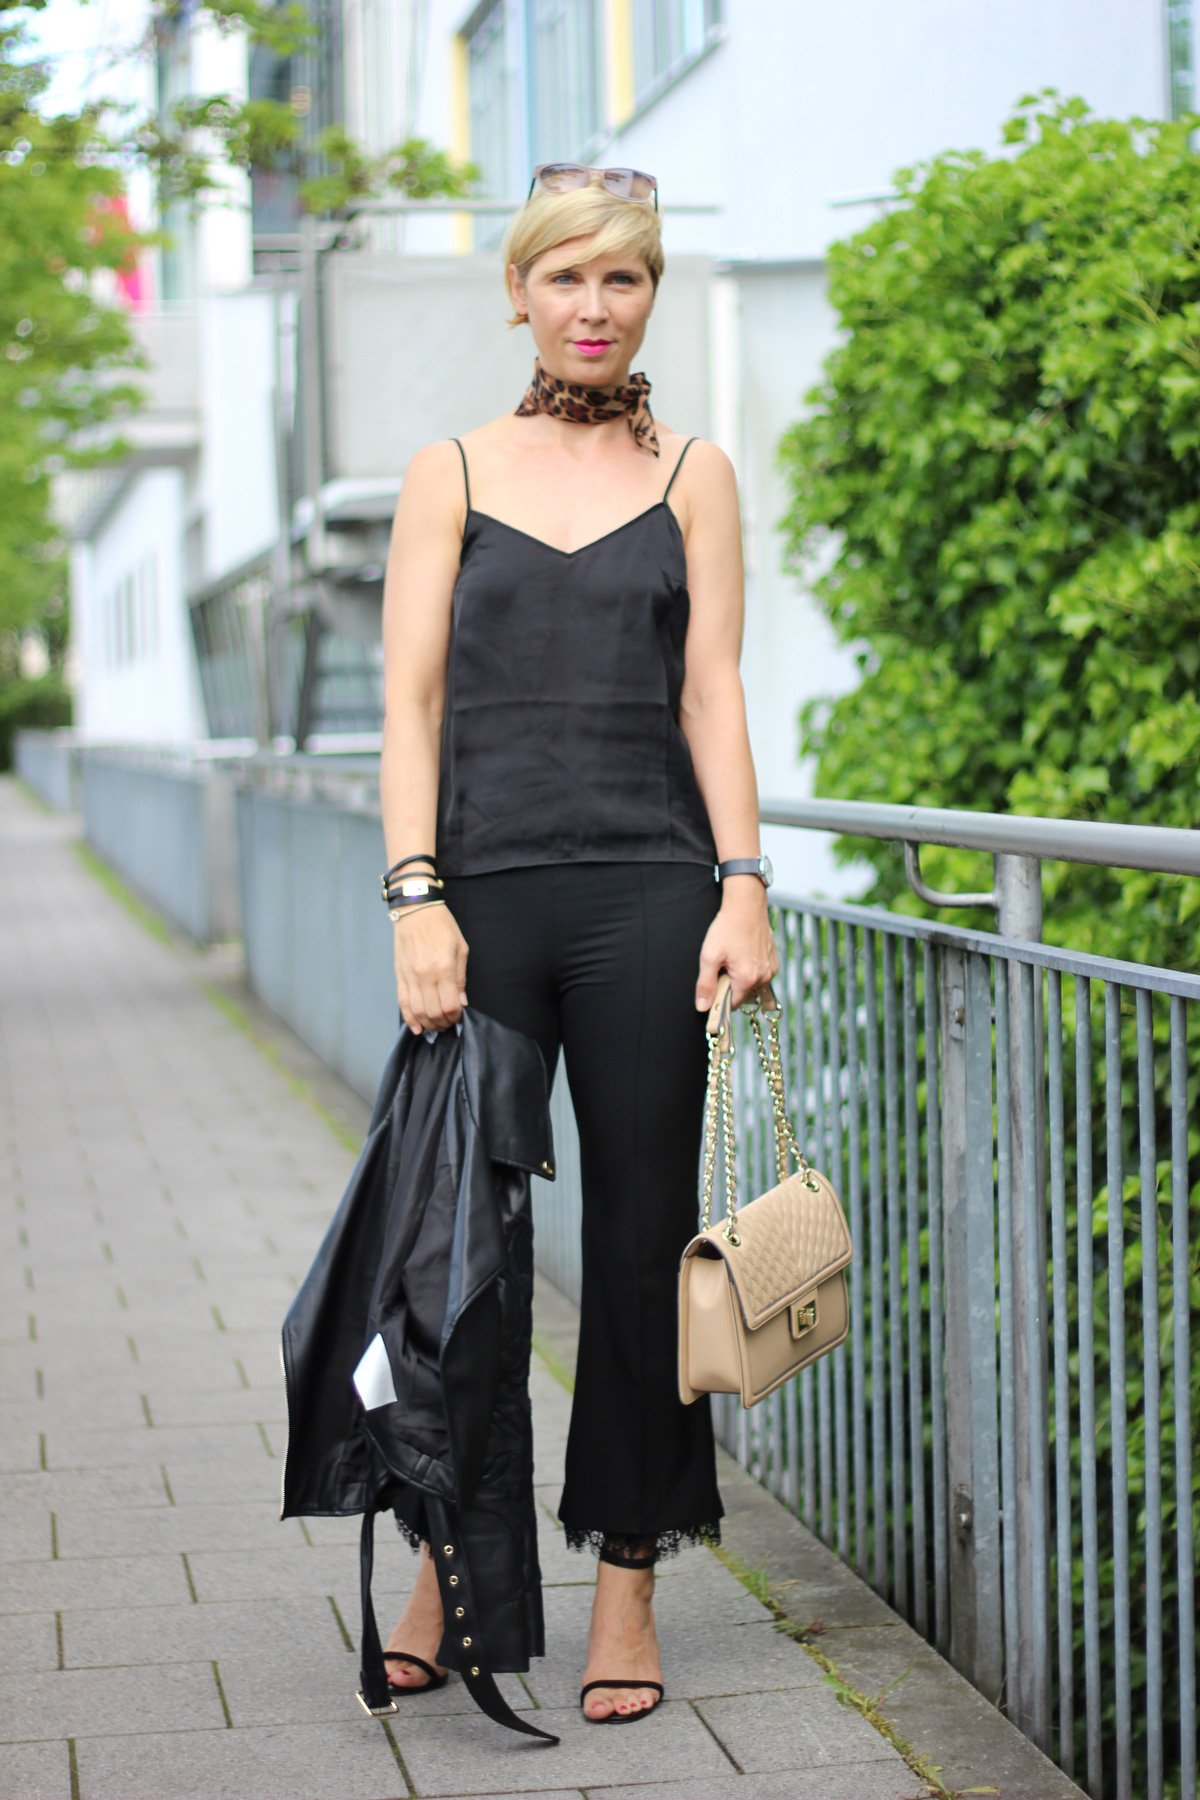 Seidentop mit Lederjacke, schwarz, Komplettlook, Sandaletten, Karl Lagerfeld, Tasche, Leo-halstuch